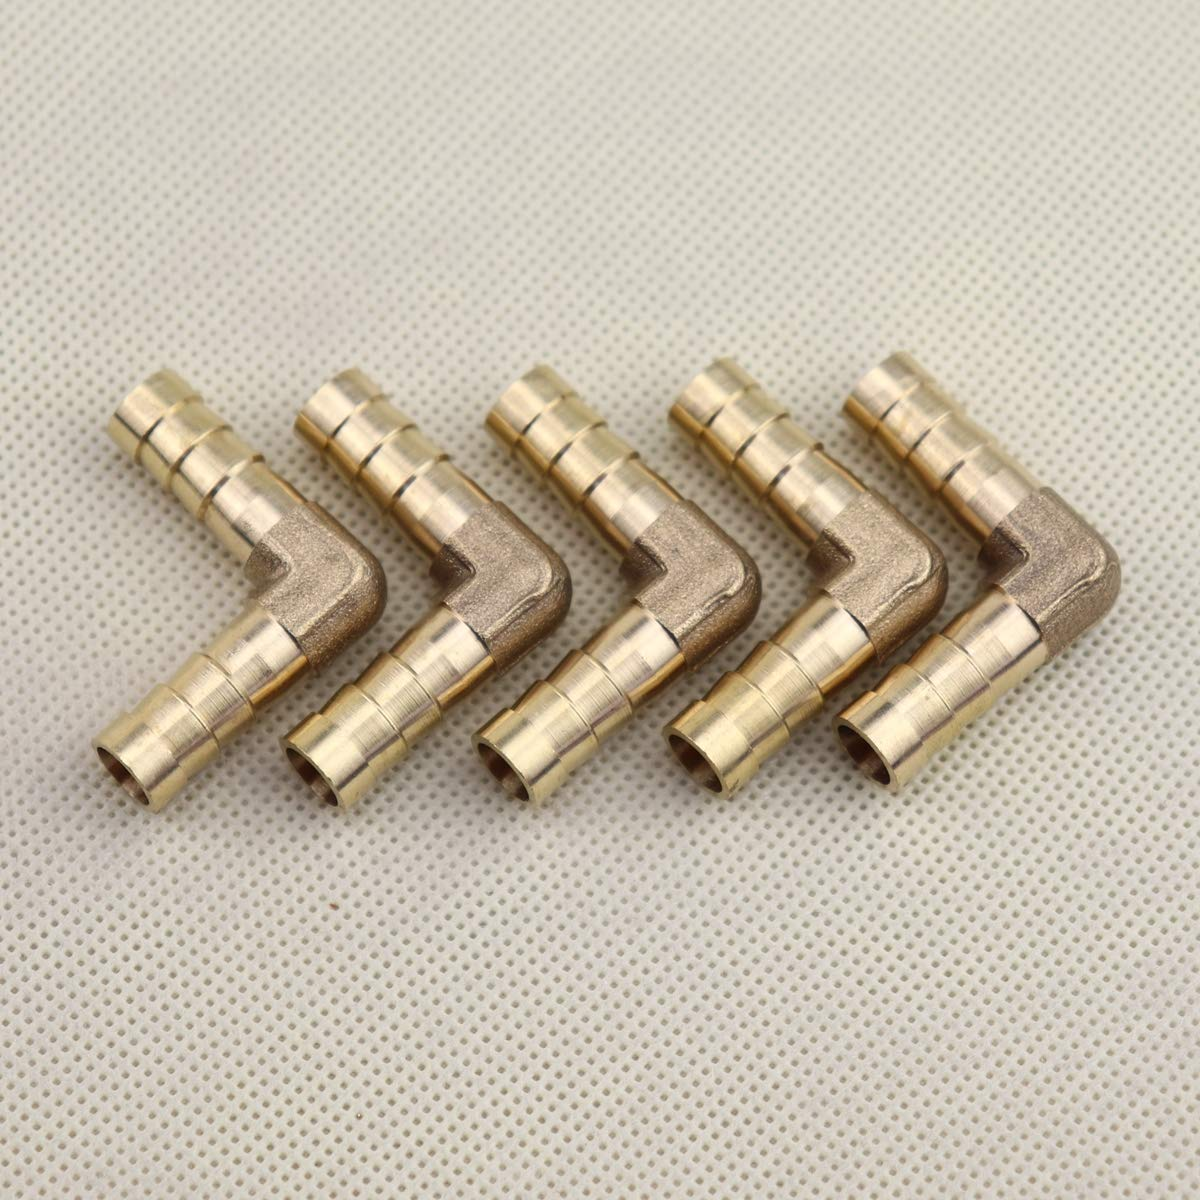 Outer Diameter=36mm Round trapezoidal leadscrew nut Steel C35Pb Tr.16x4 Single Start Left Length=32mm